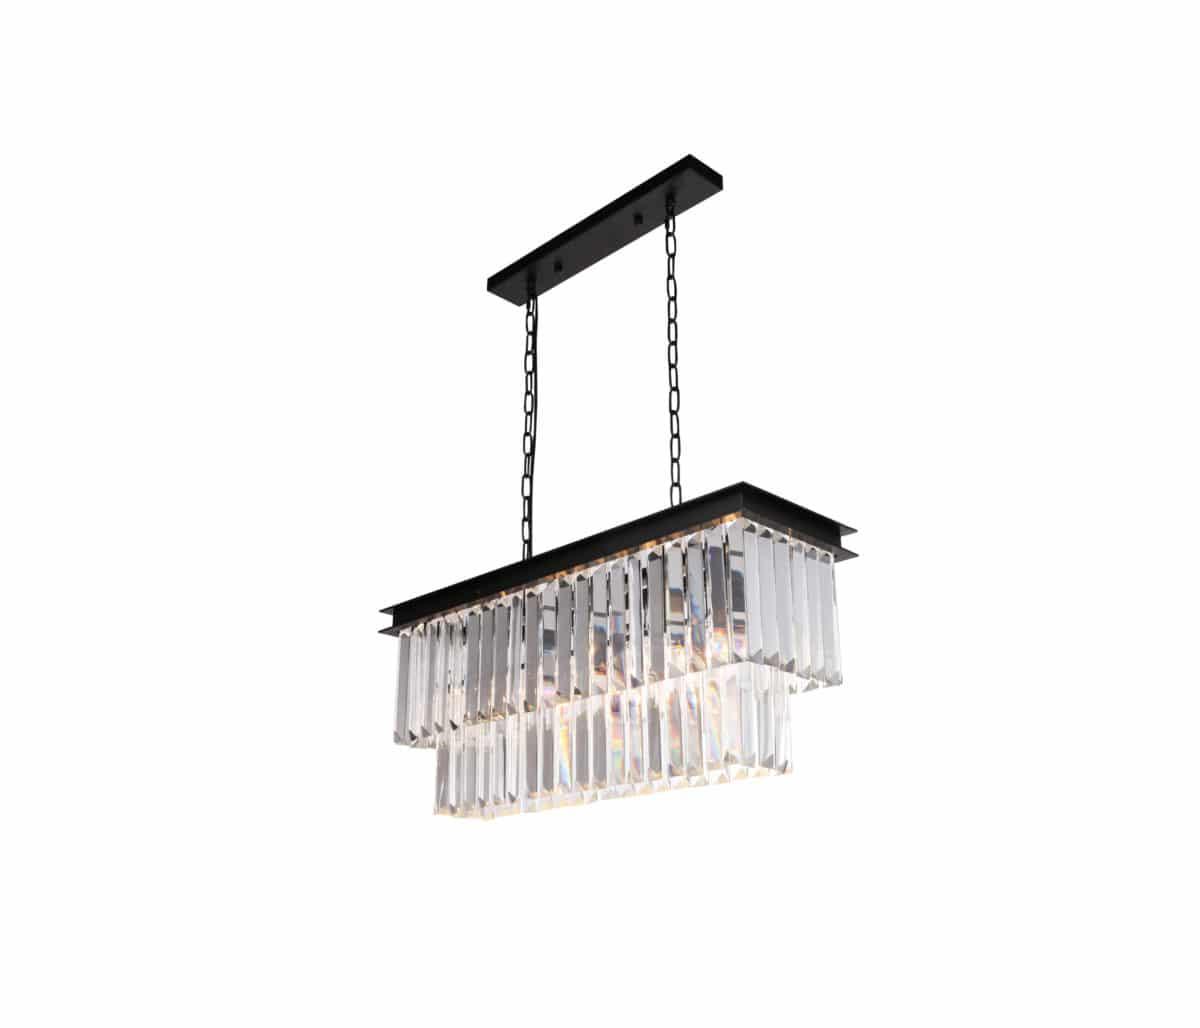 Lucent crystal light fixture pendant lighting